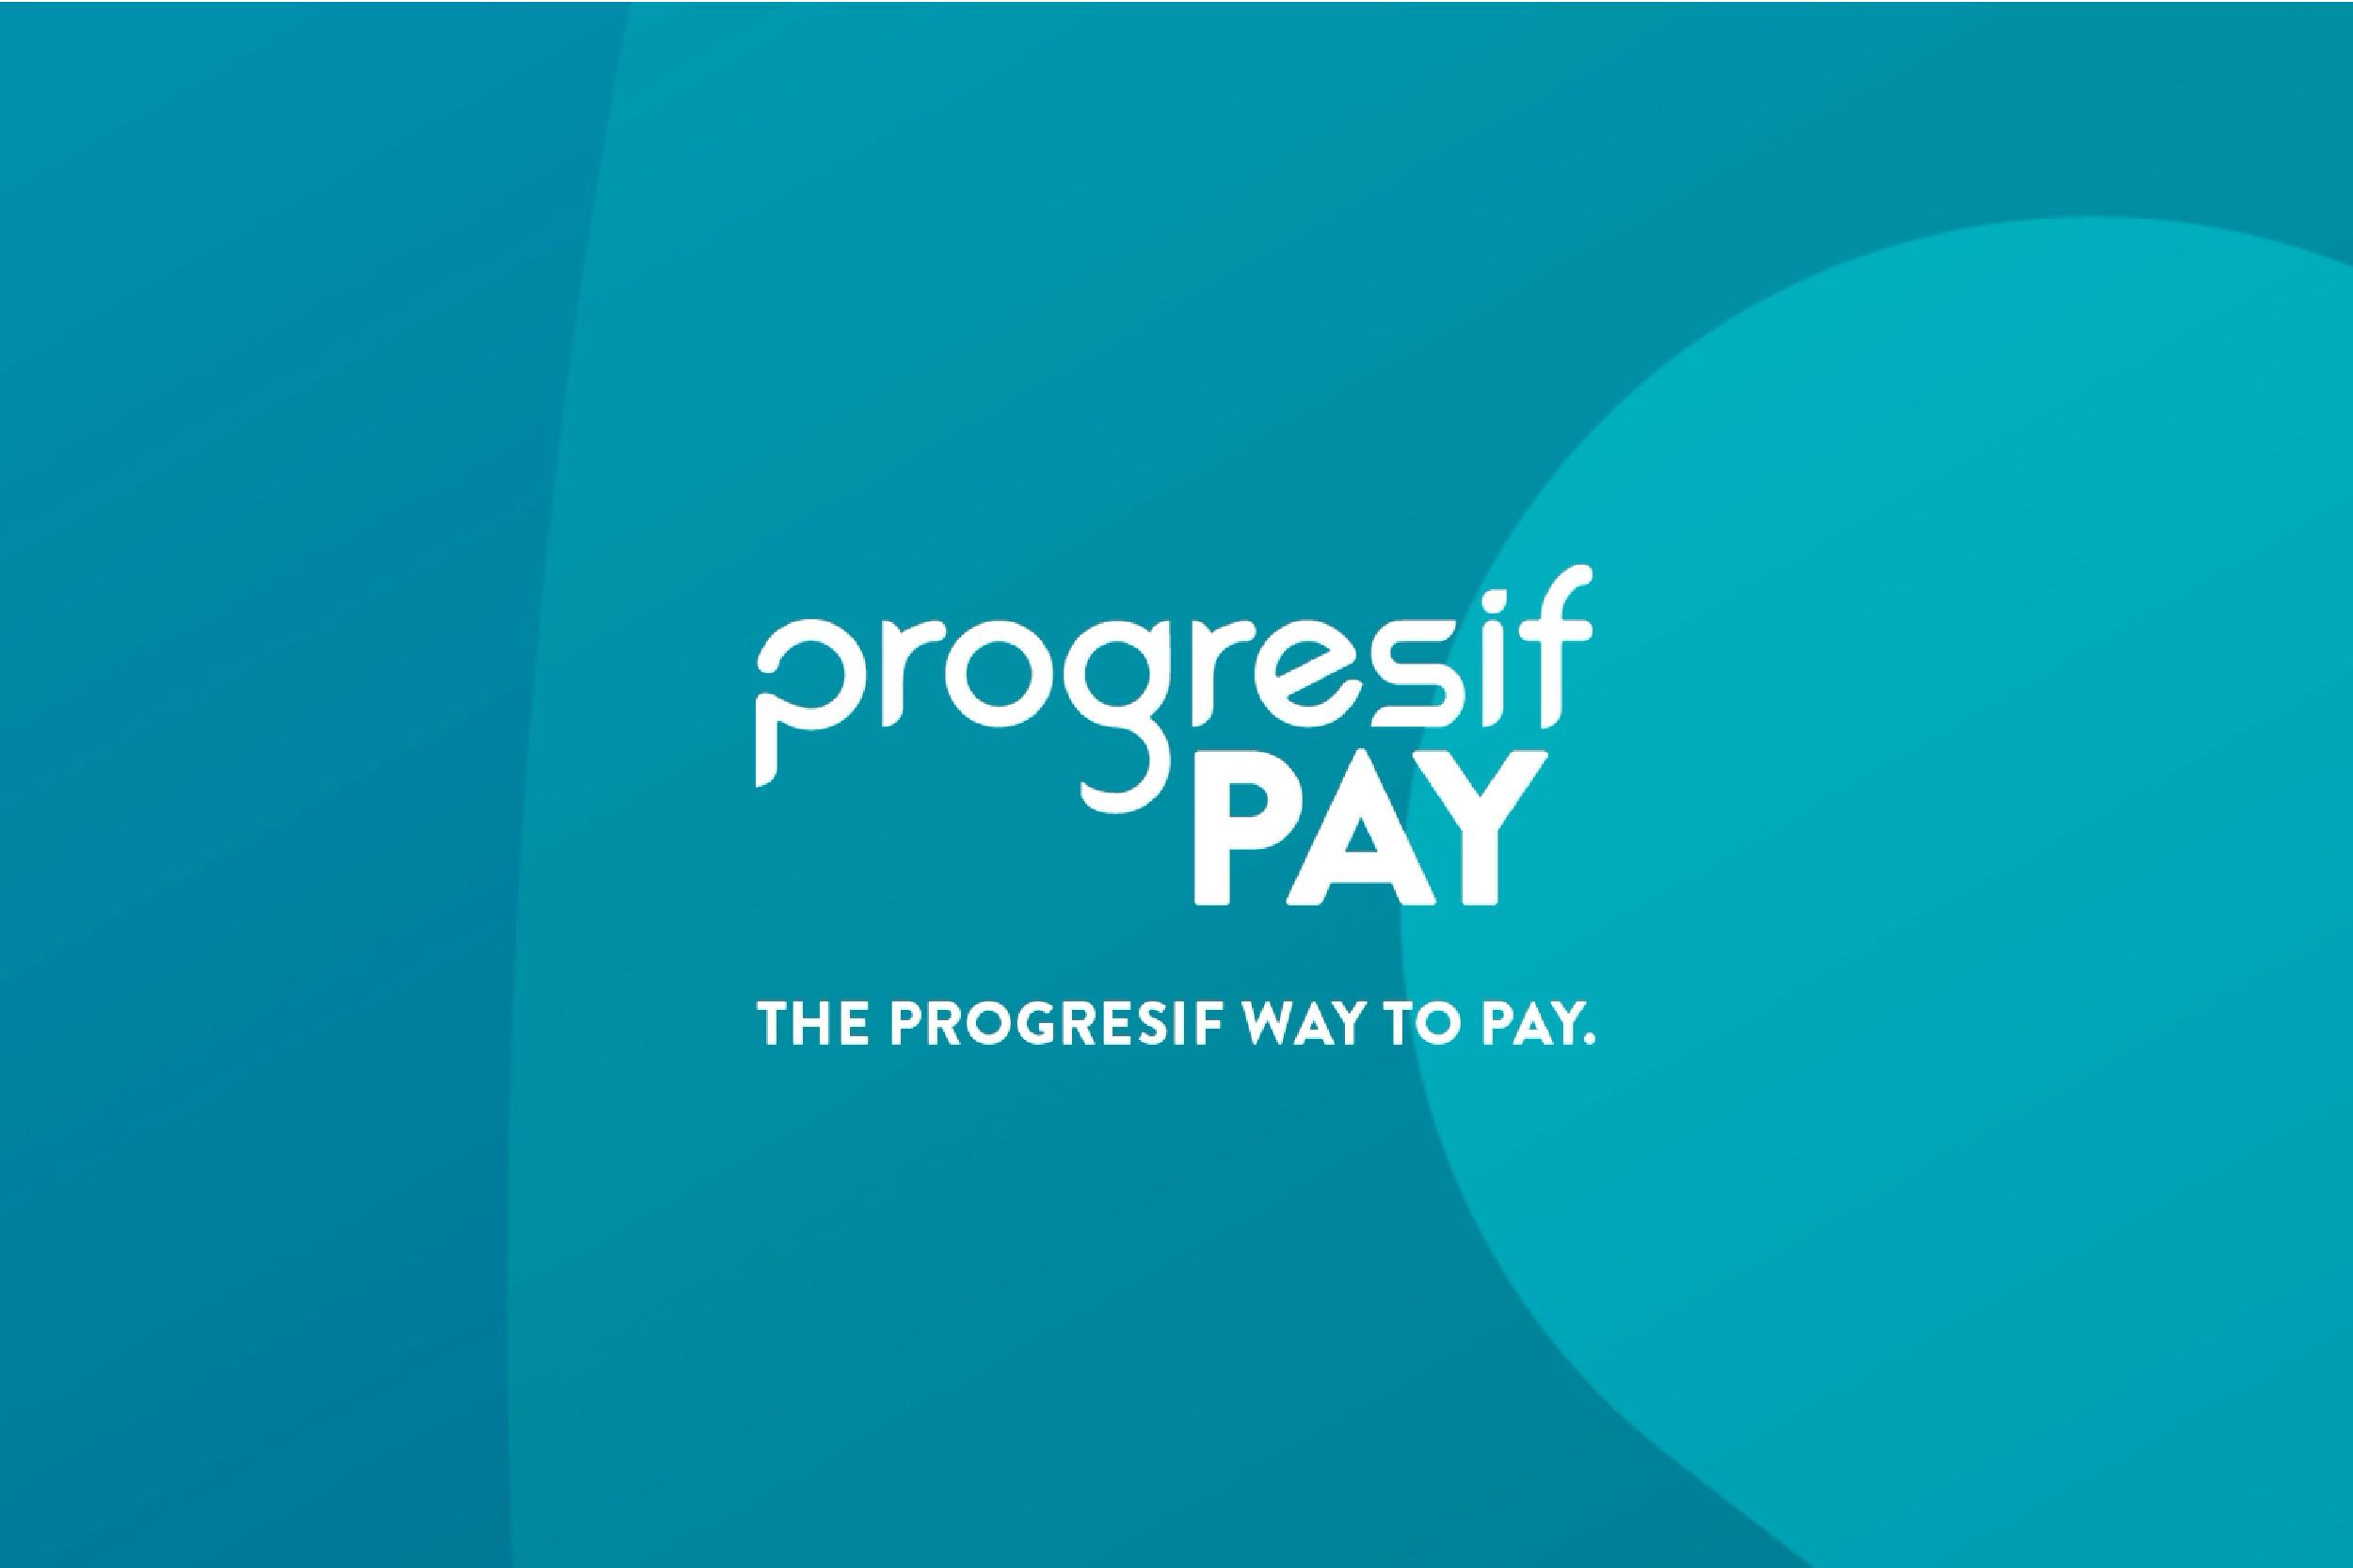 Progresif Pay_Laptop Banner - Progresif Pay.jpg